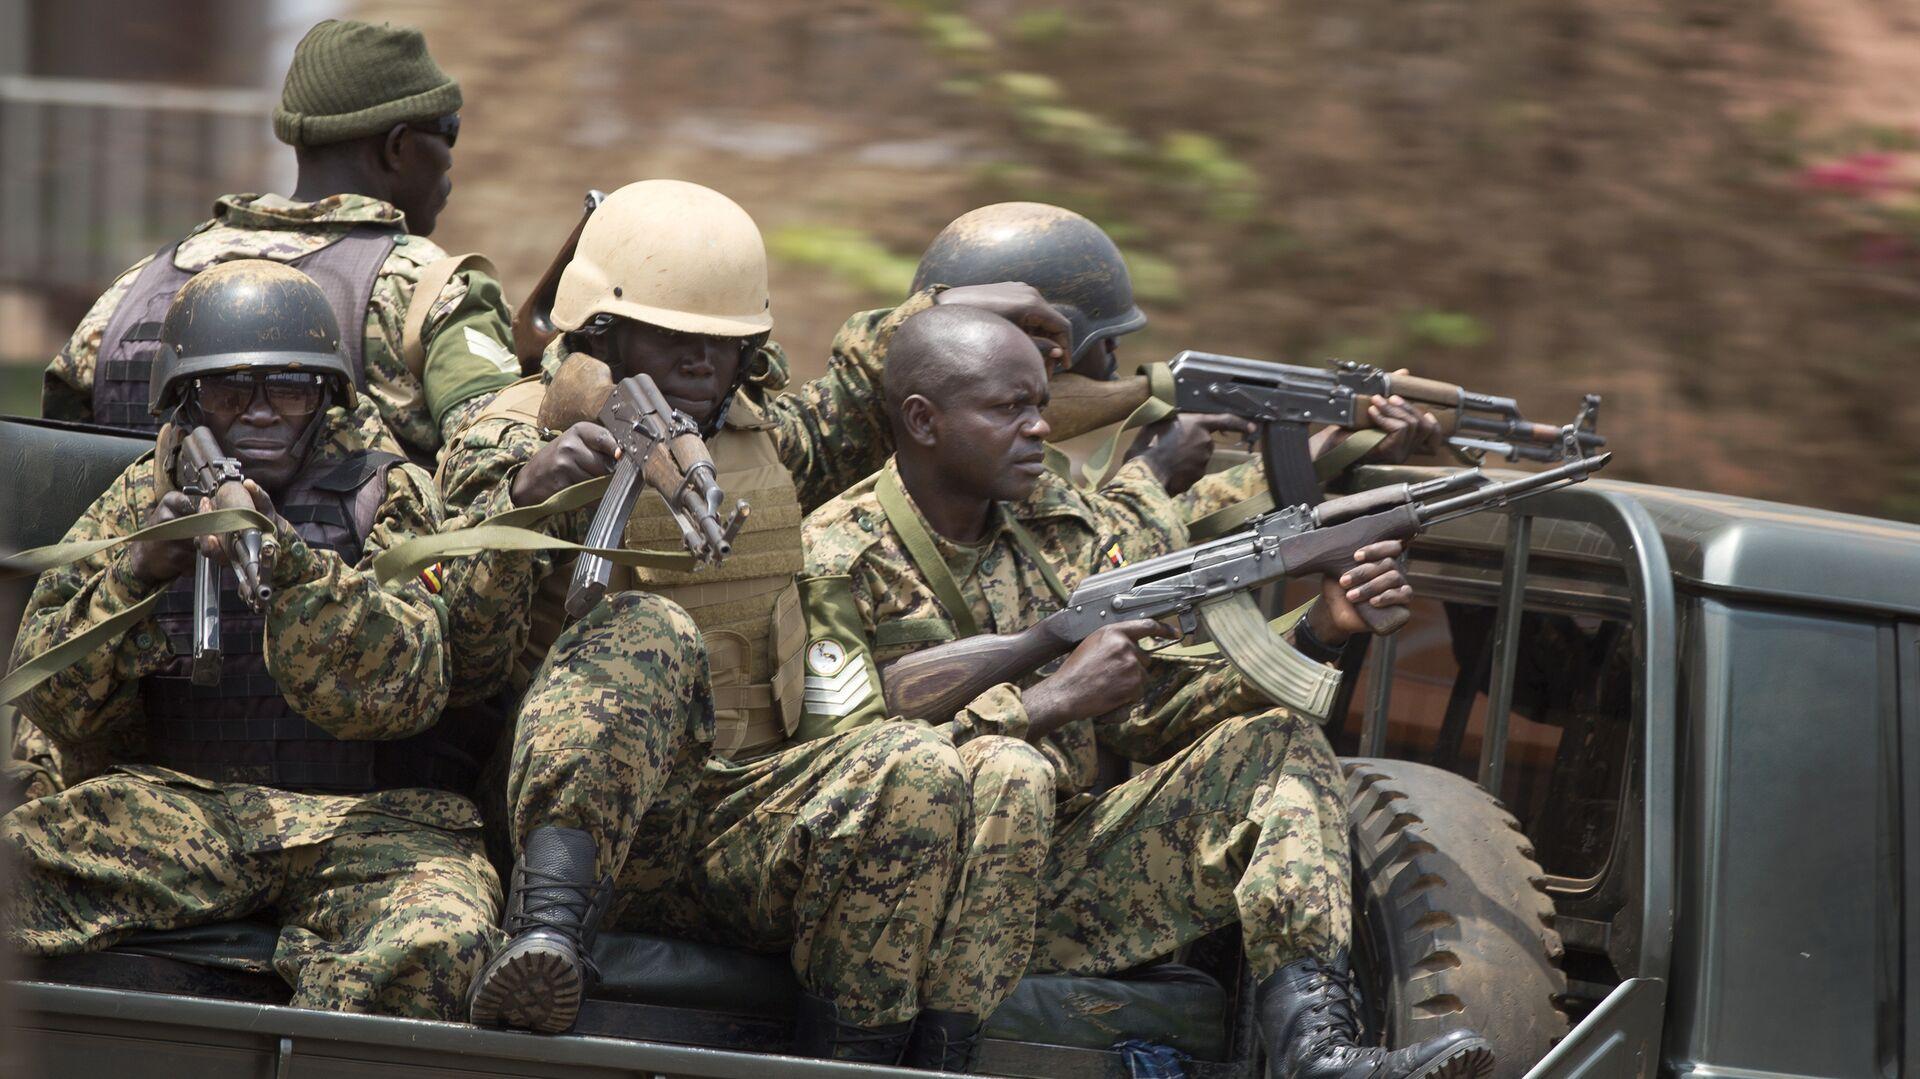 Soldados de Uganda (archivo) - Sputnik Mundo, 1920, 30.03.2021